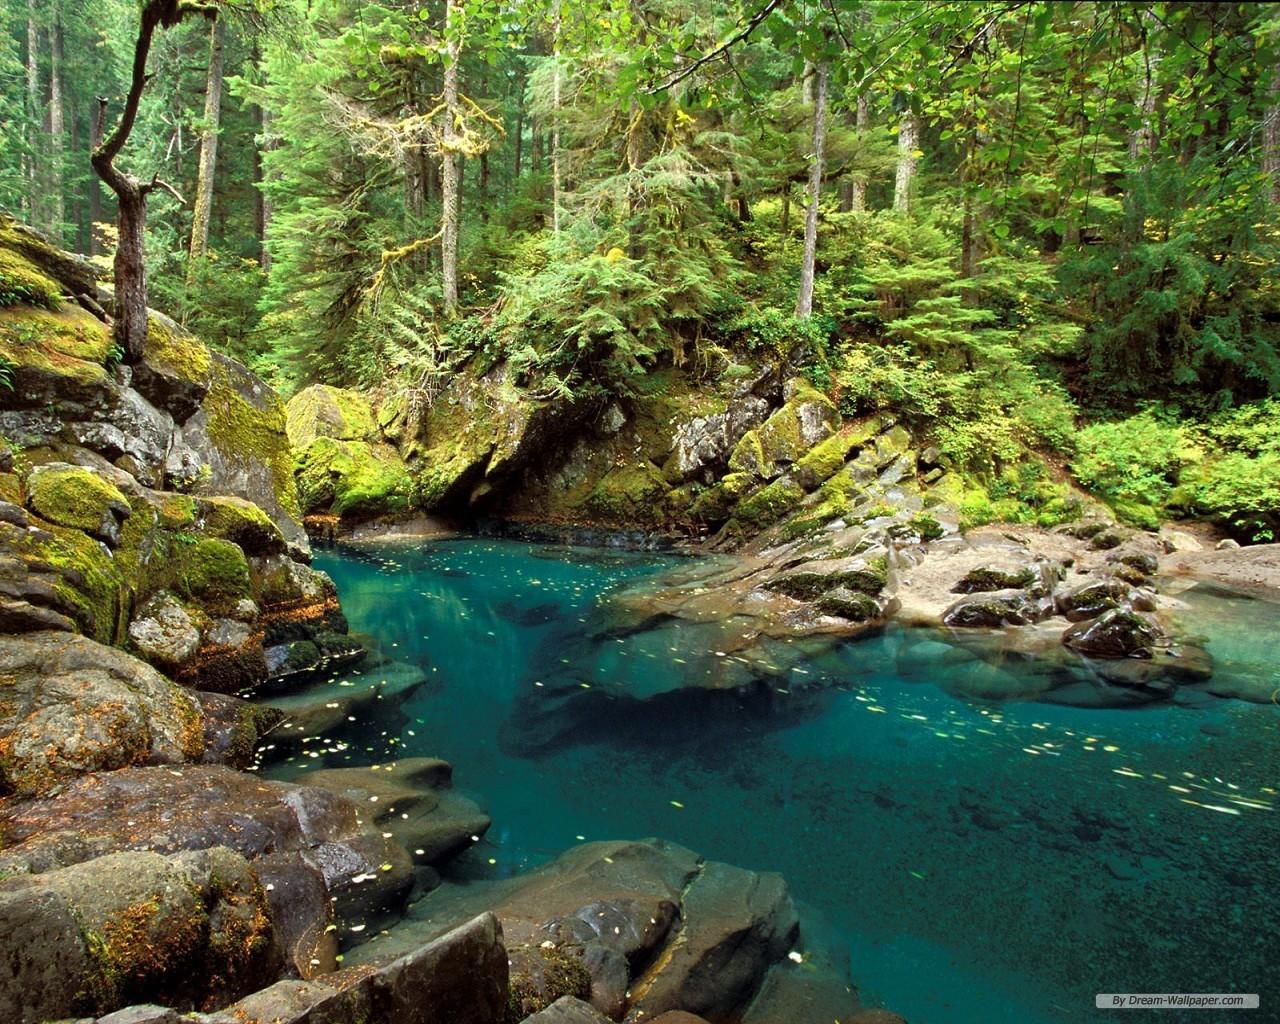 Orman manzara resimleri hd